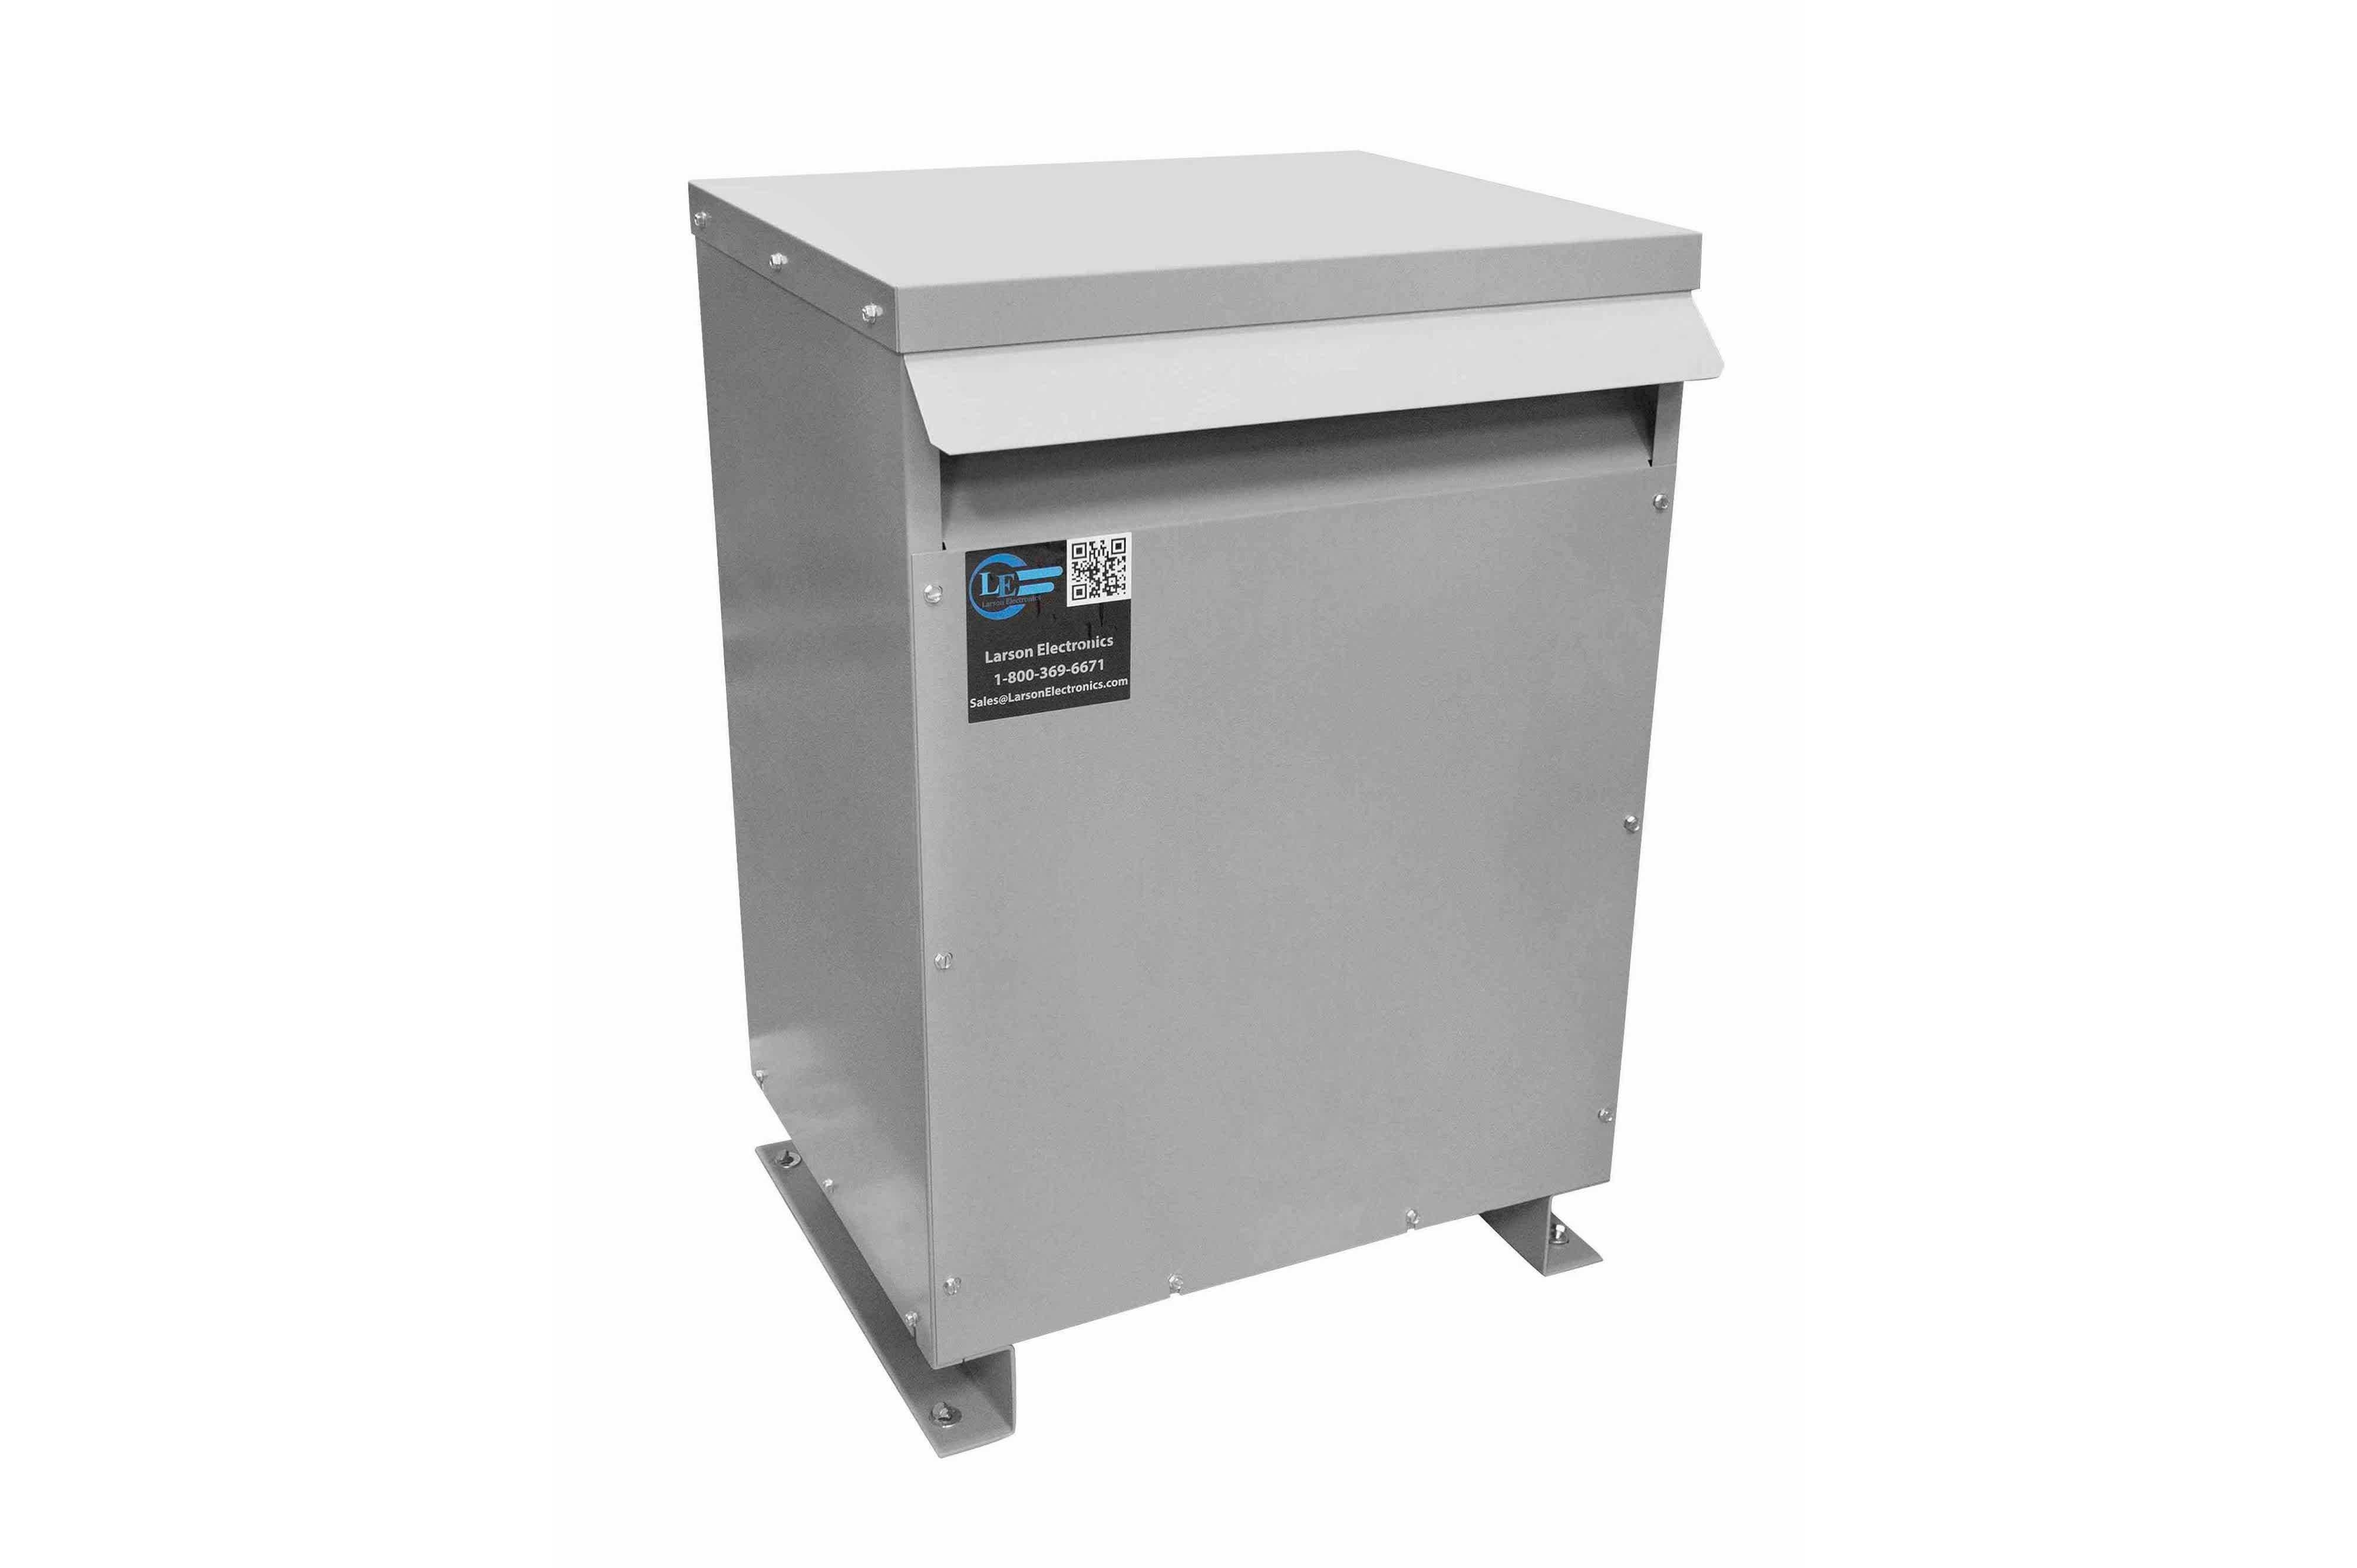 100 kVA 3PH Isolation Transformer, 380V Wye Primary, 240V Delta Secondary, N3R, Ventilated, 60 Hz